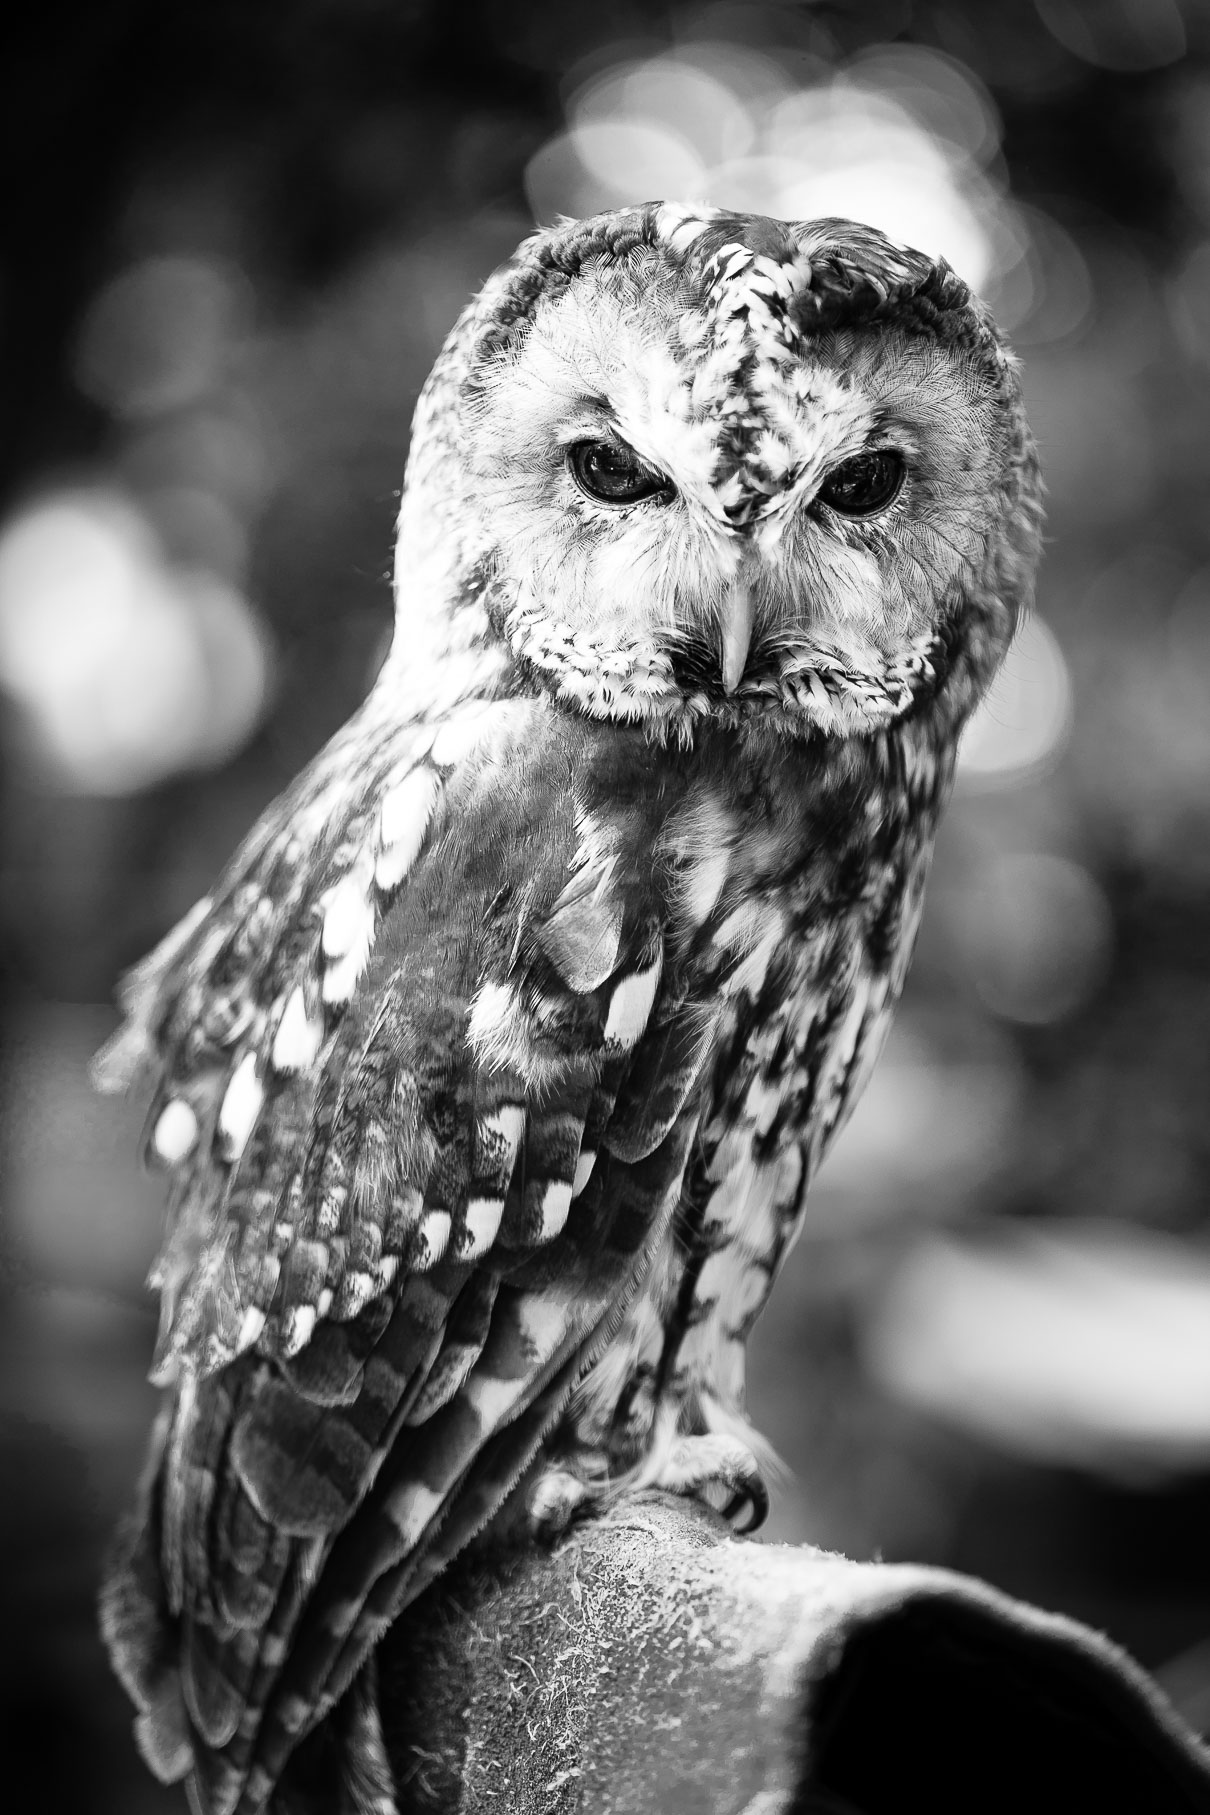 alexa-wright-photography-owl.jpg